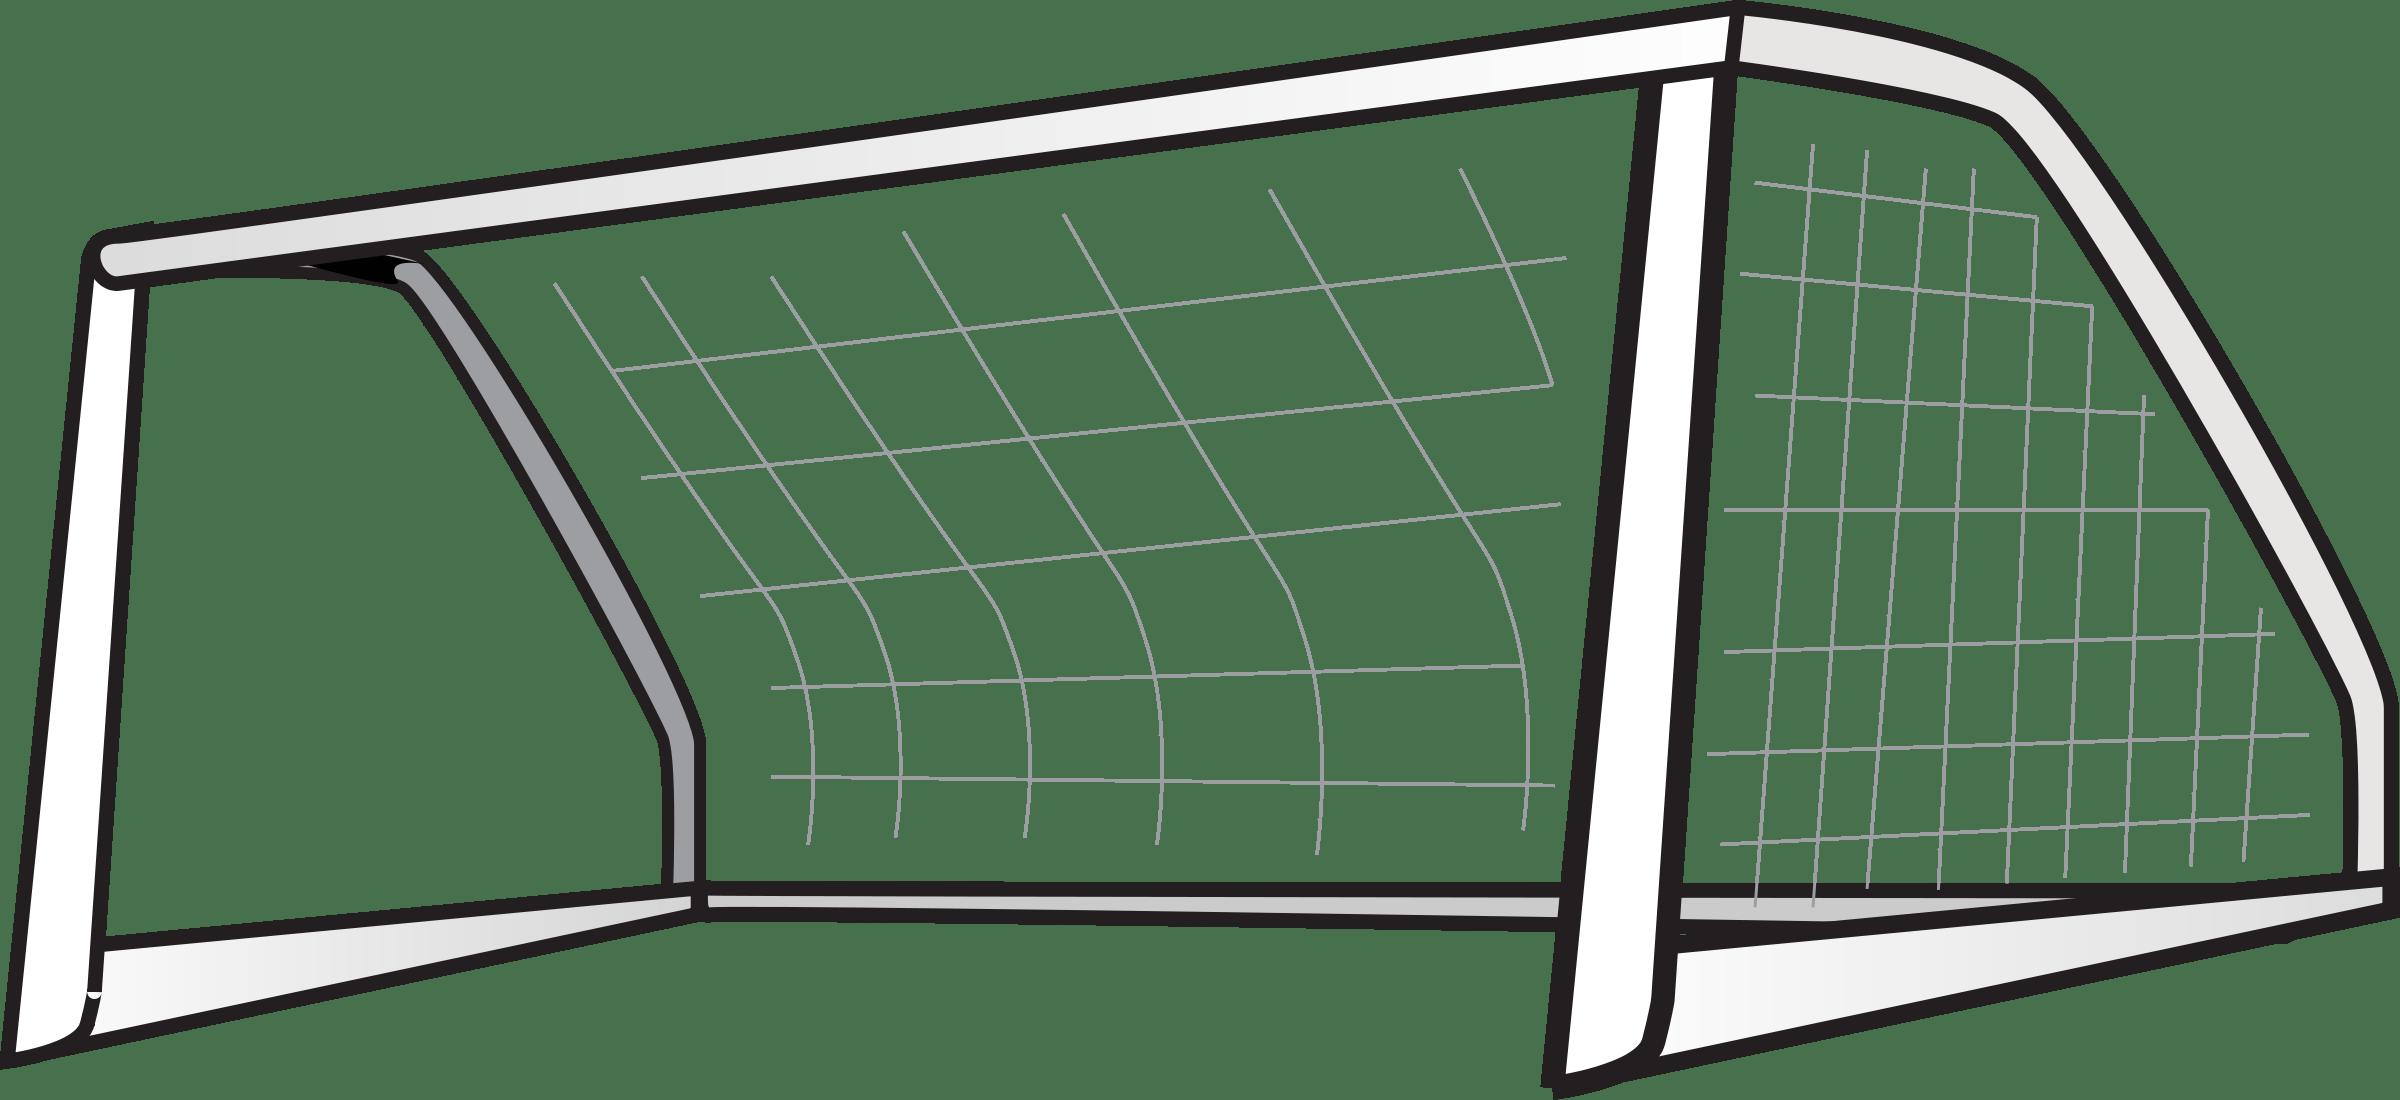 Soccer Goal Clip Art Clipart Panda